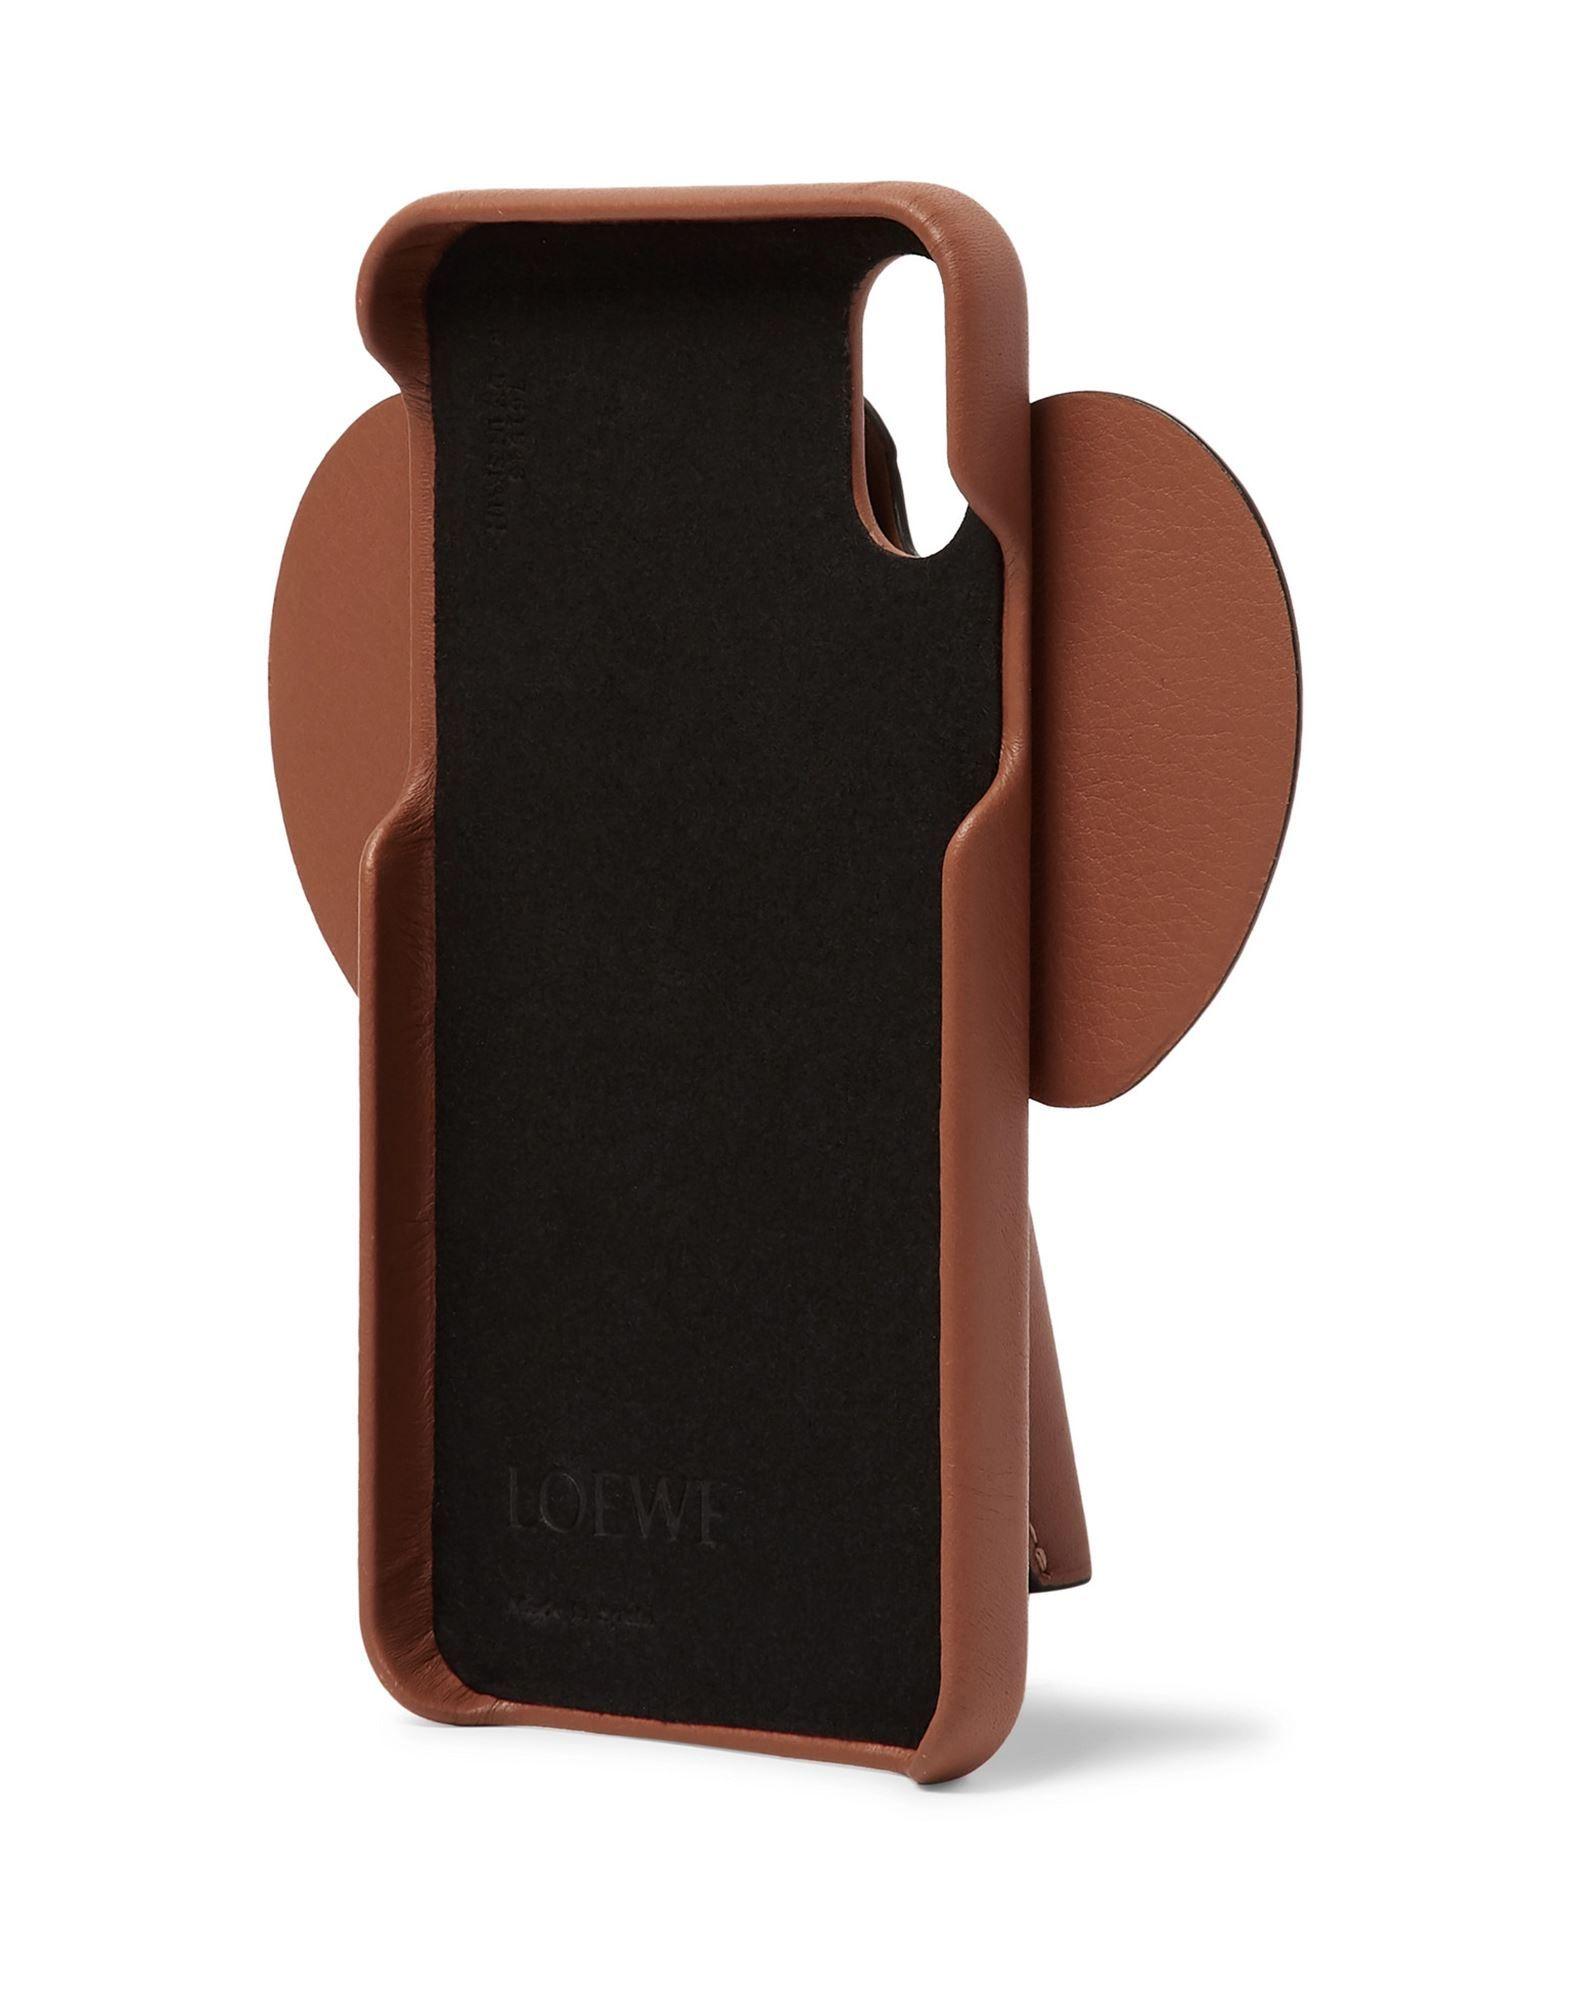 Loewe Leather Elephant Phone Case - iPhone X/XS